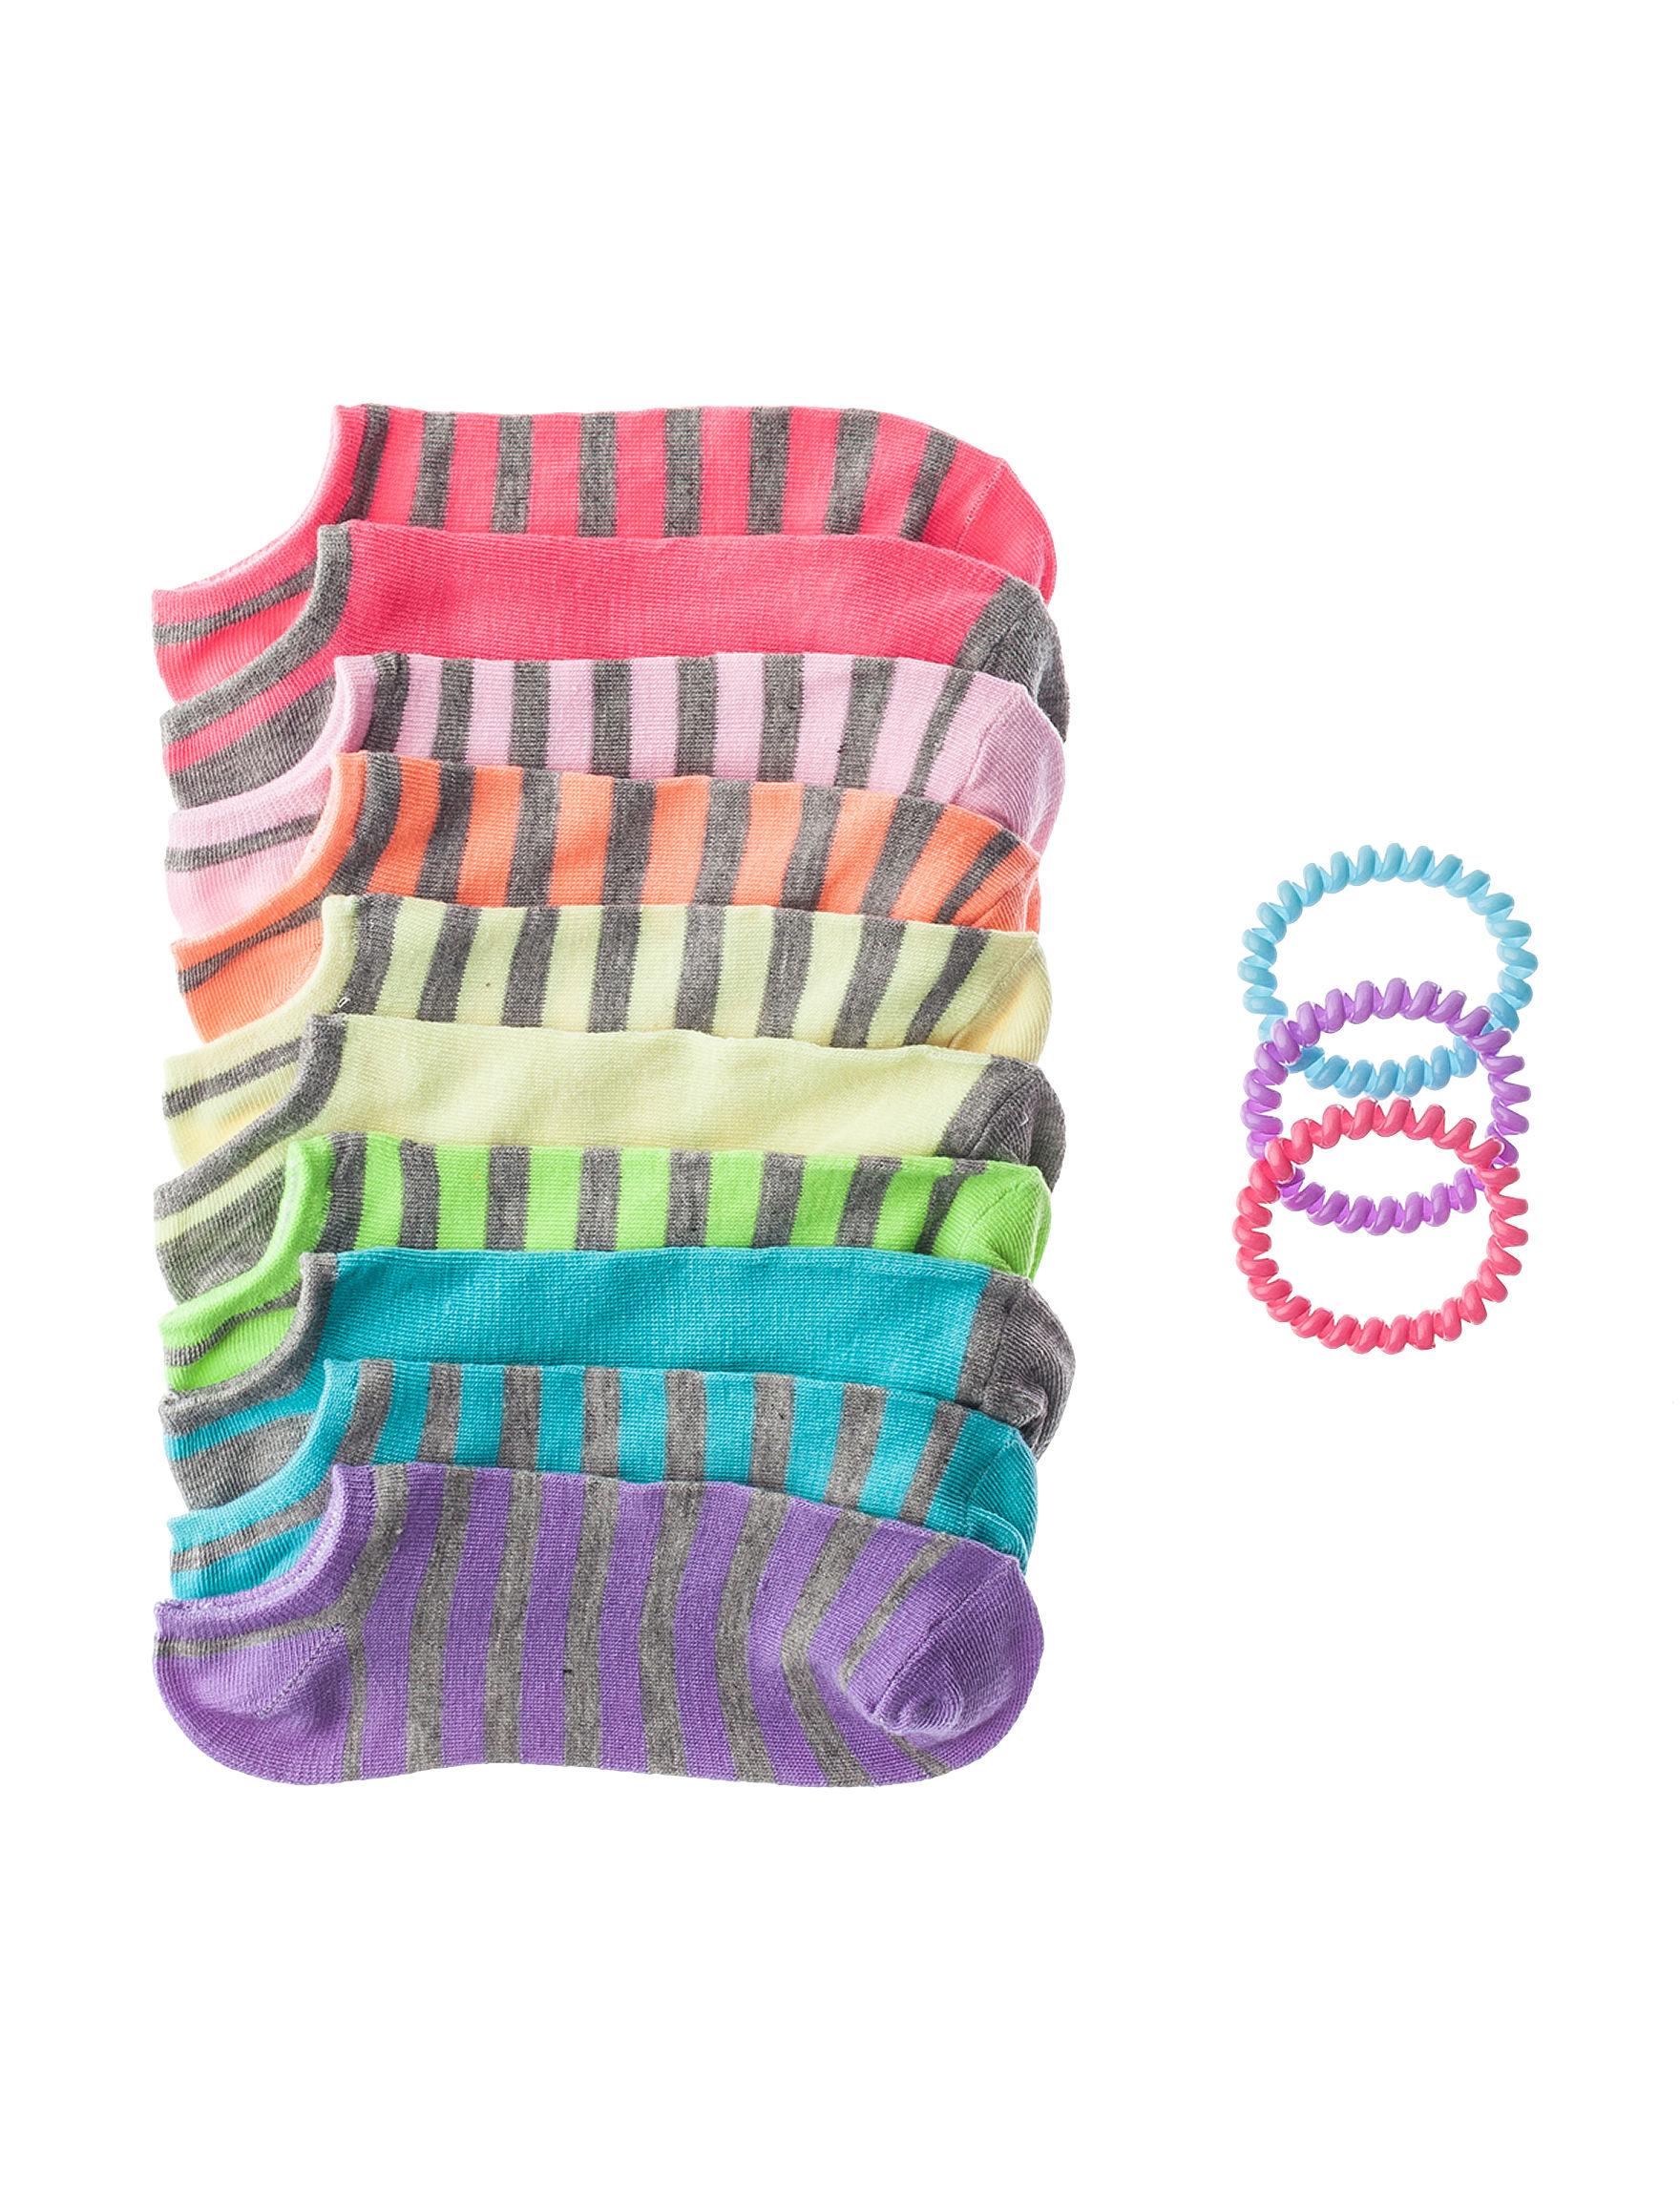 Charlotte & Co. Multi Socks